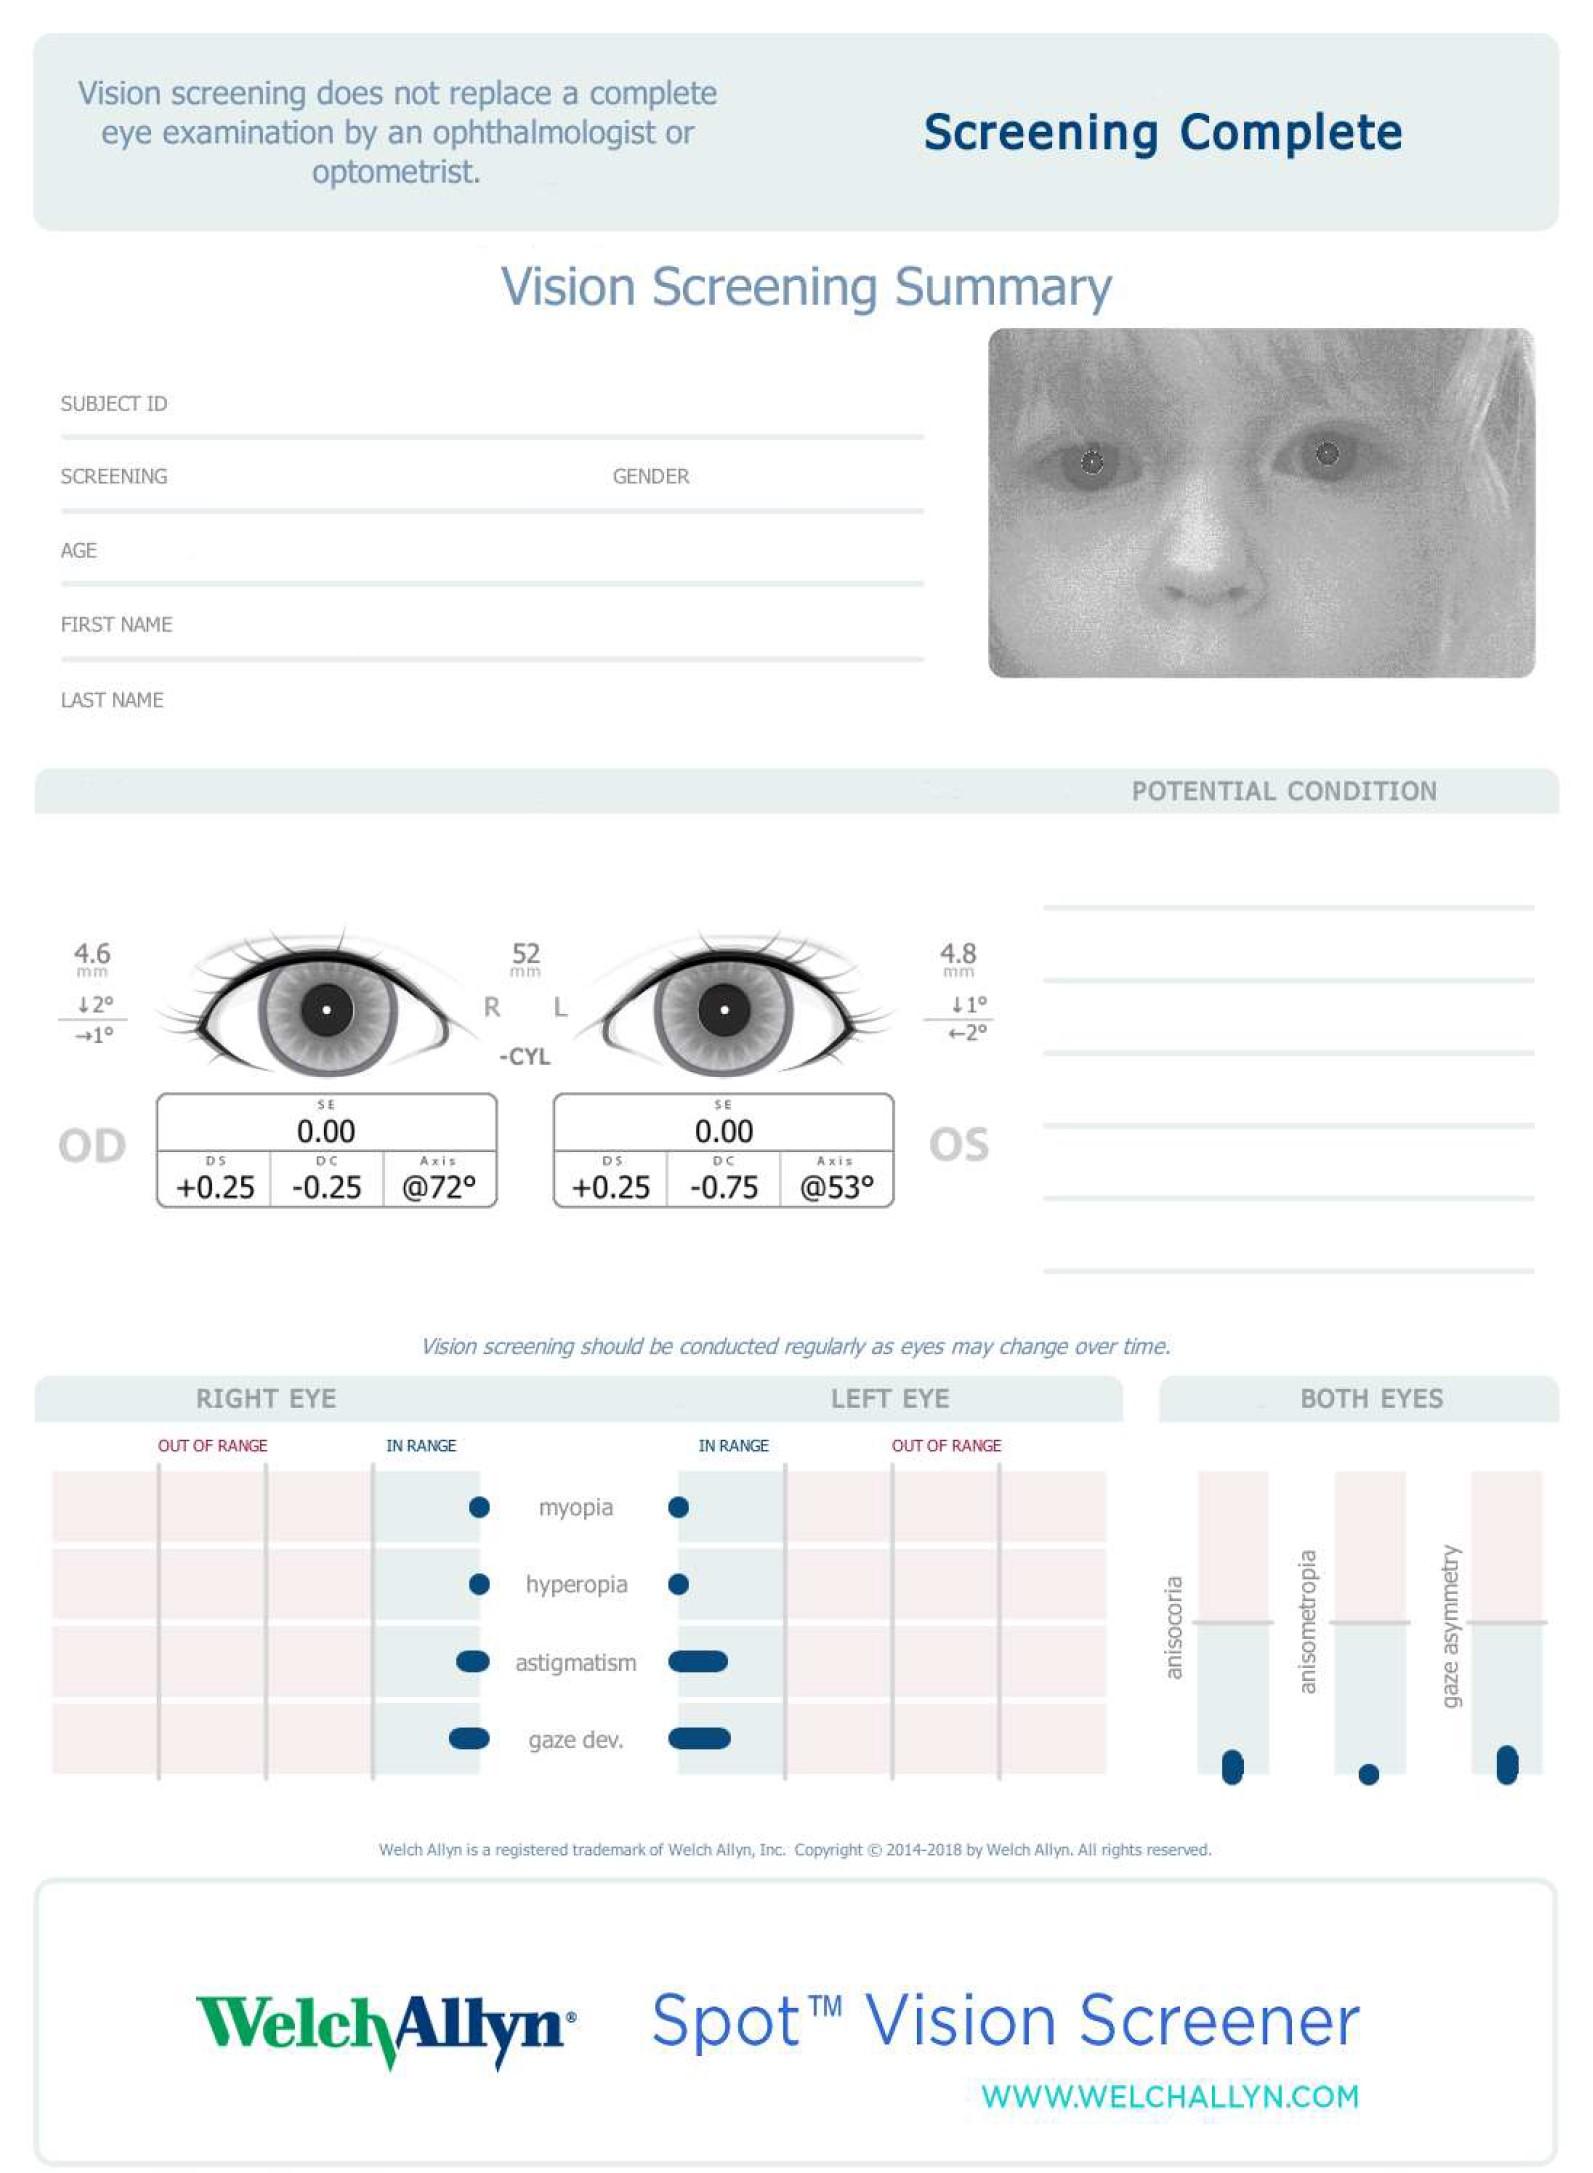 Kid's vision screening printout